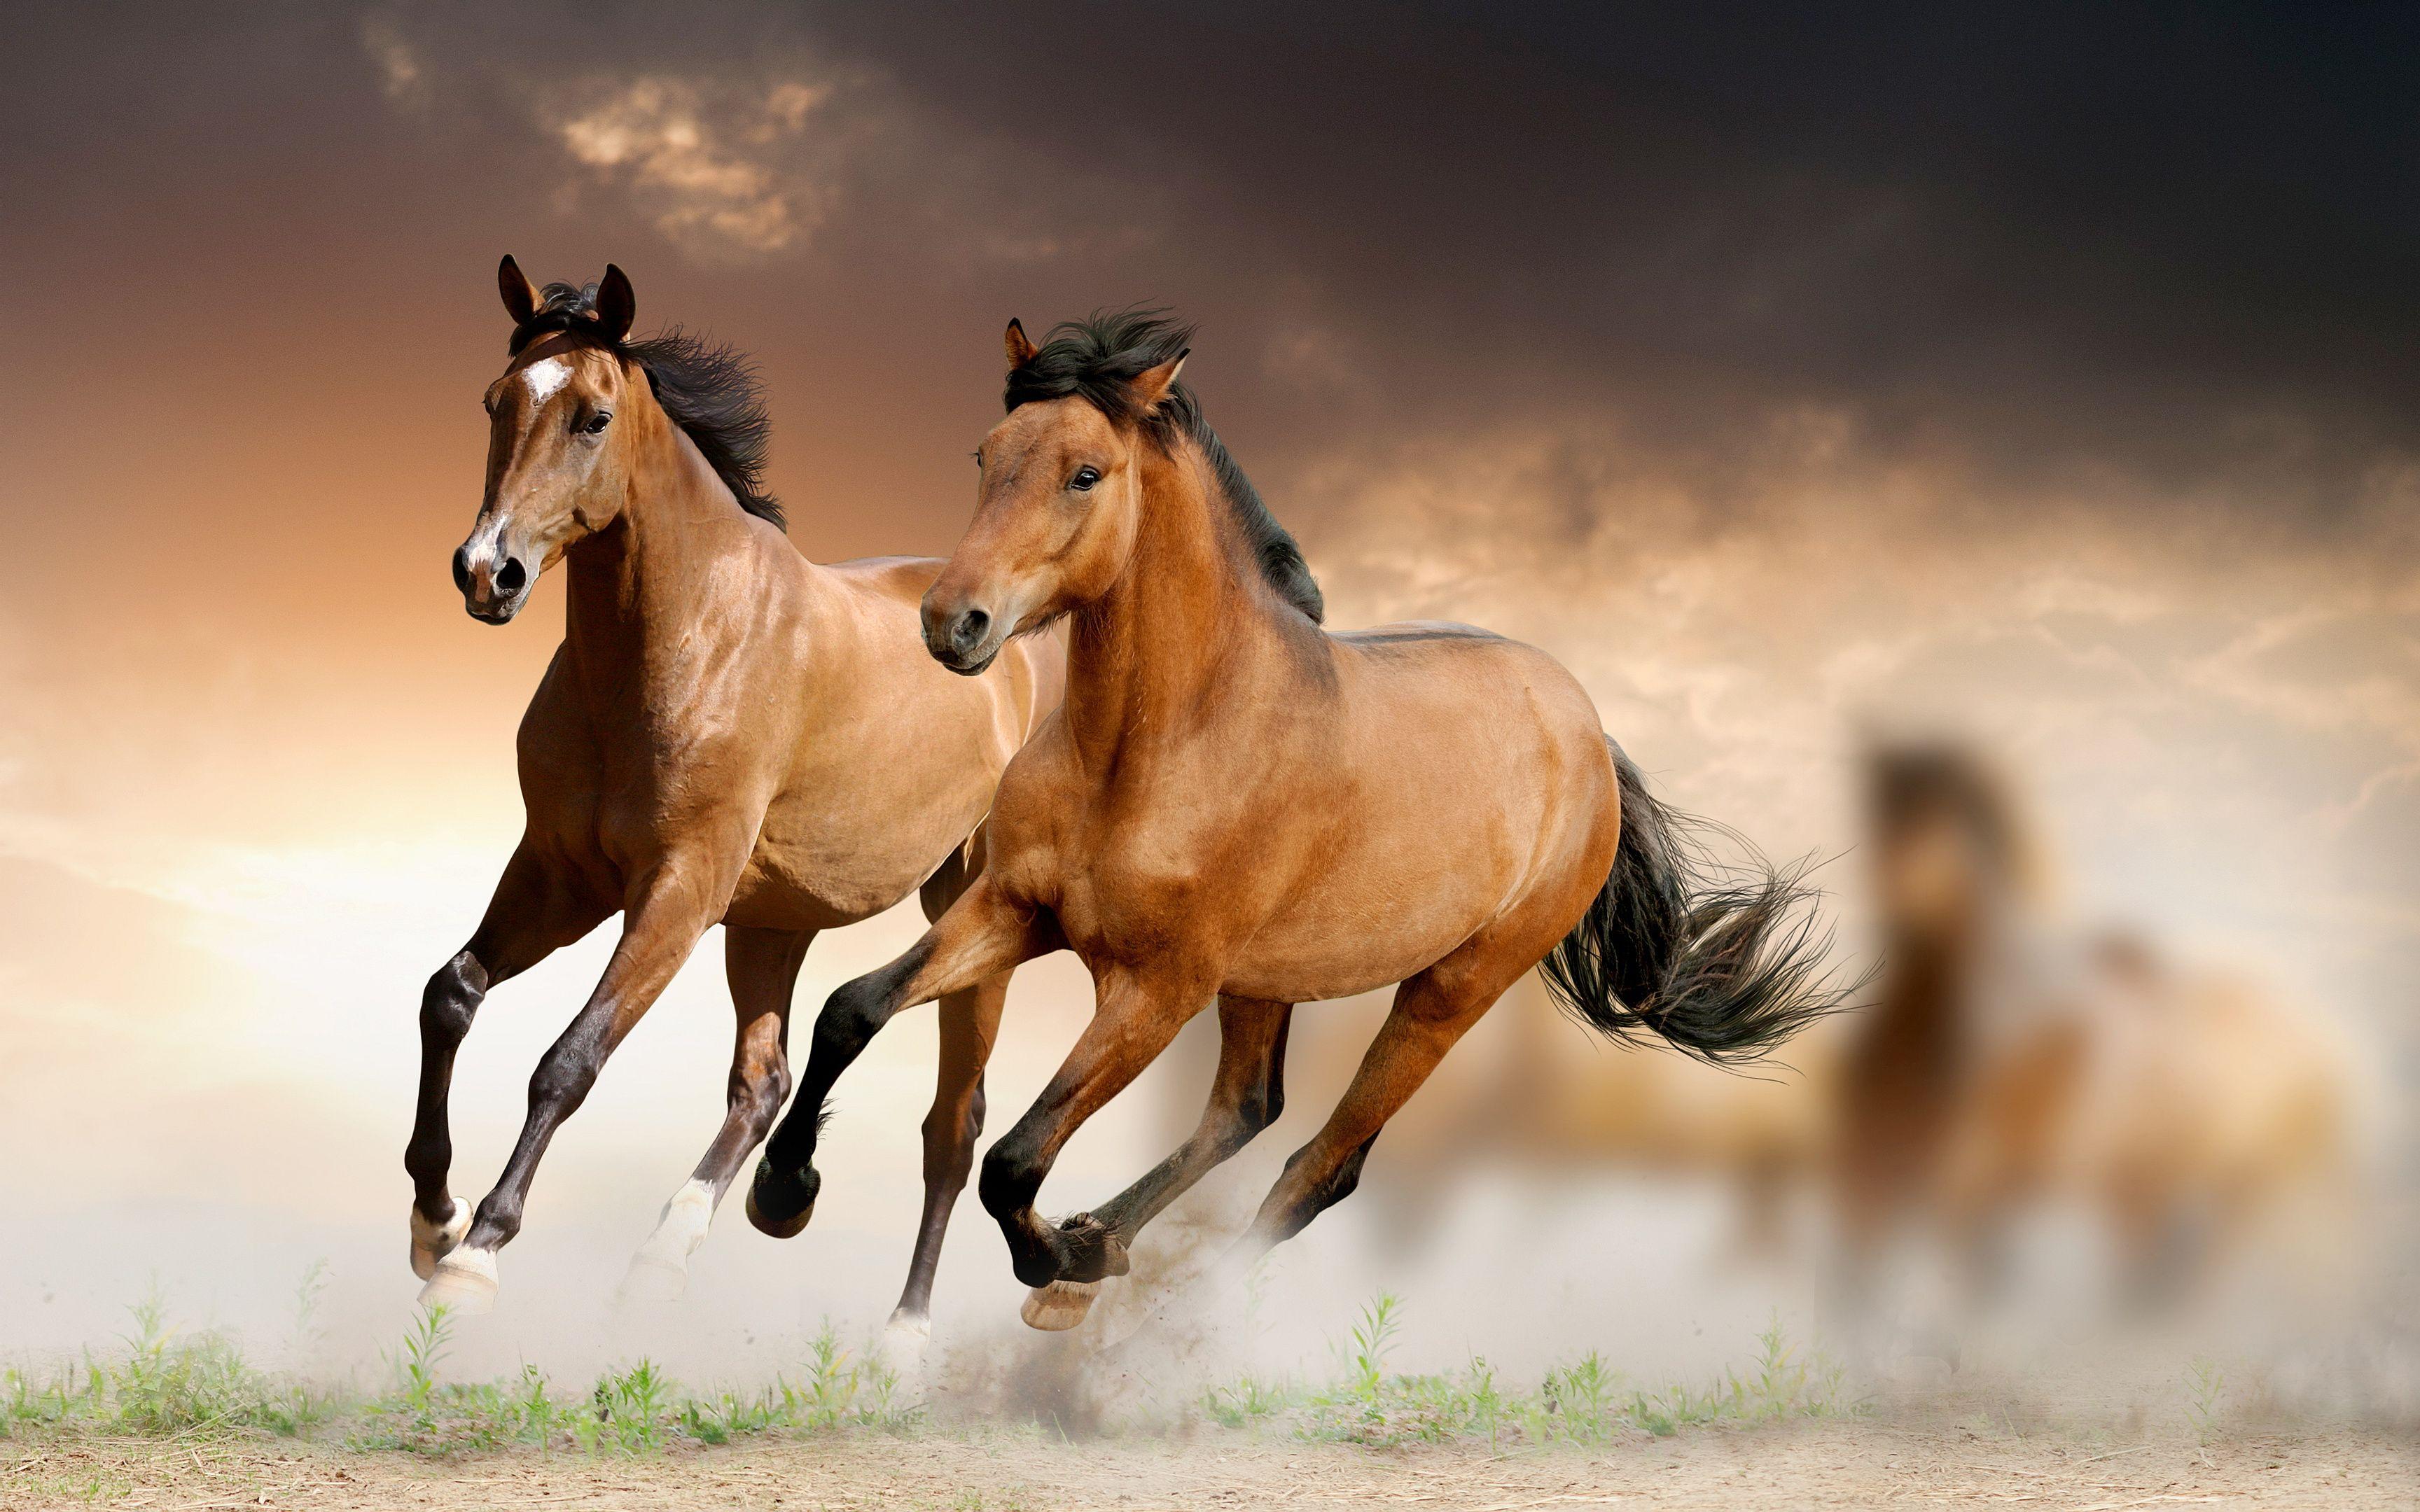 Horse Shoes Horse Wallpaper Beautiful Horses Horses